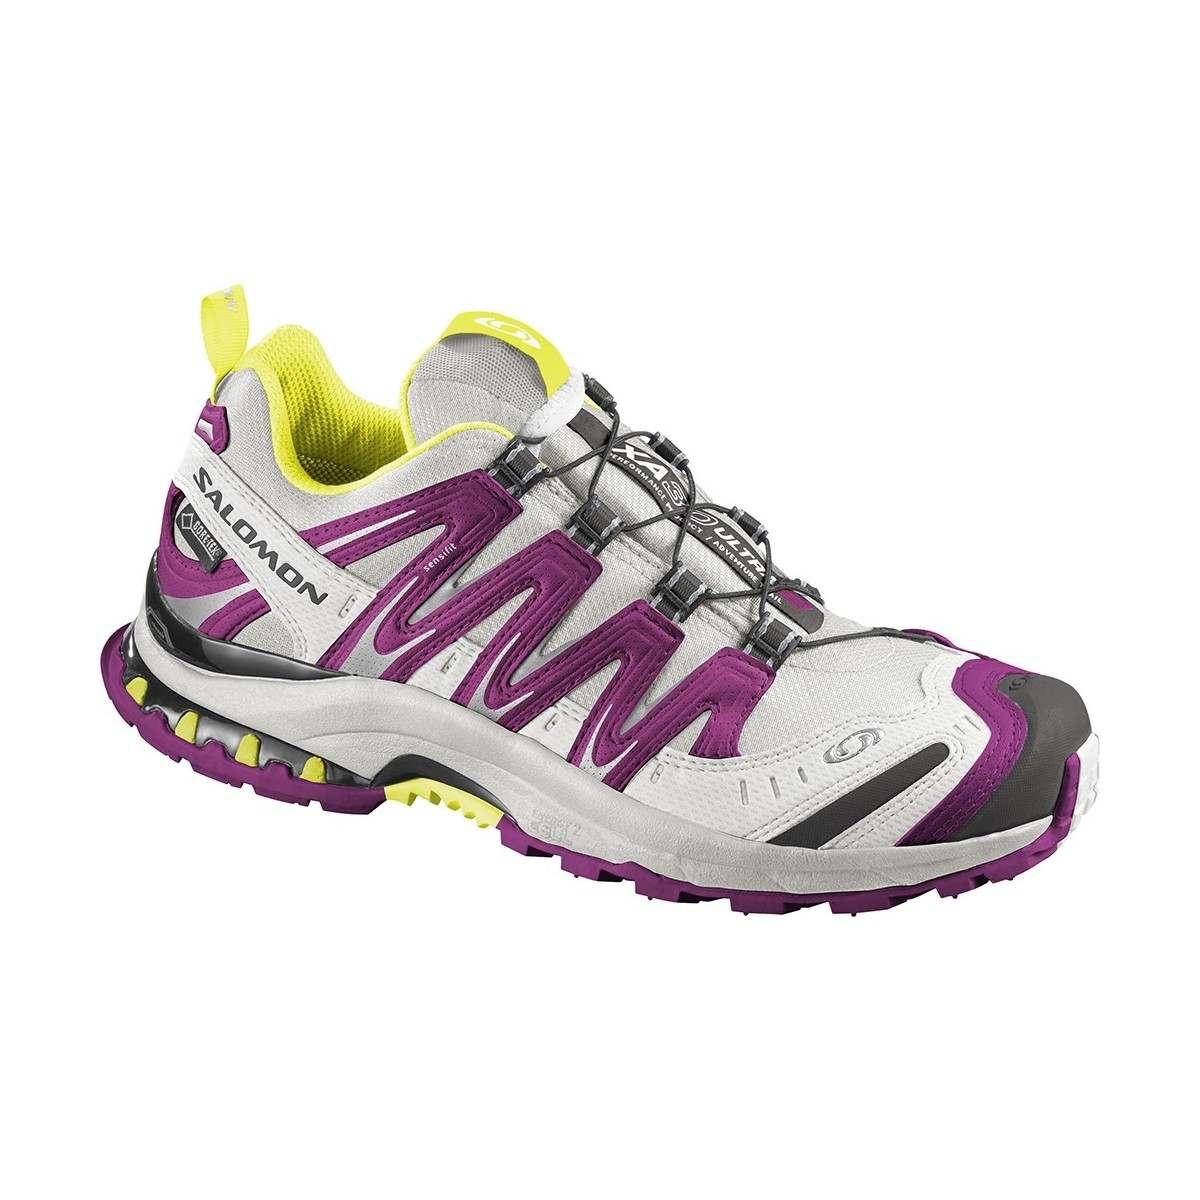 salomon xa pro 3d ultra 2 gtx women 39 s running trail. Black Bedroom Furniture Sets. Home Design Ideas